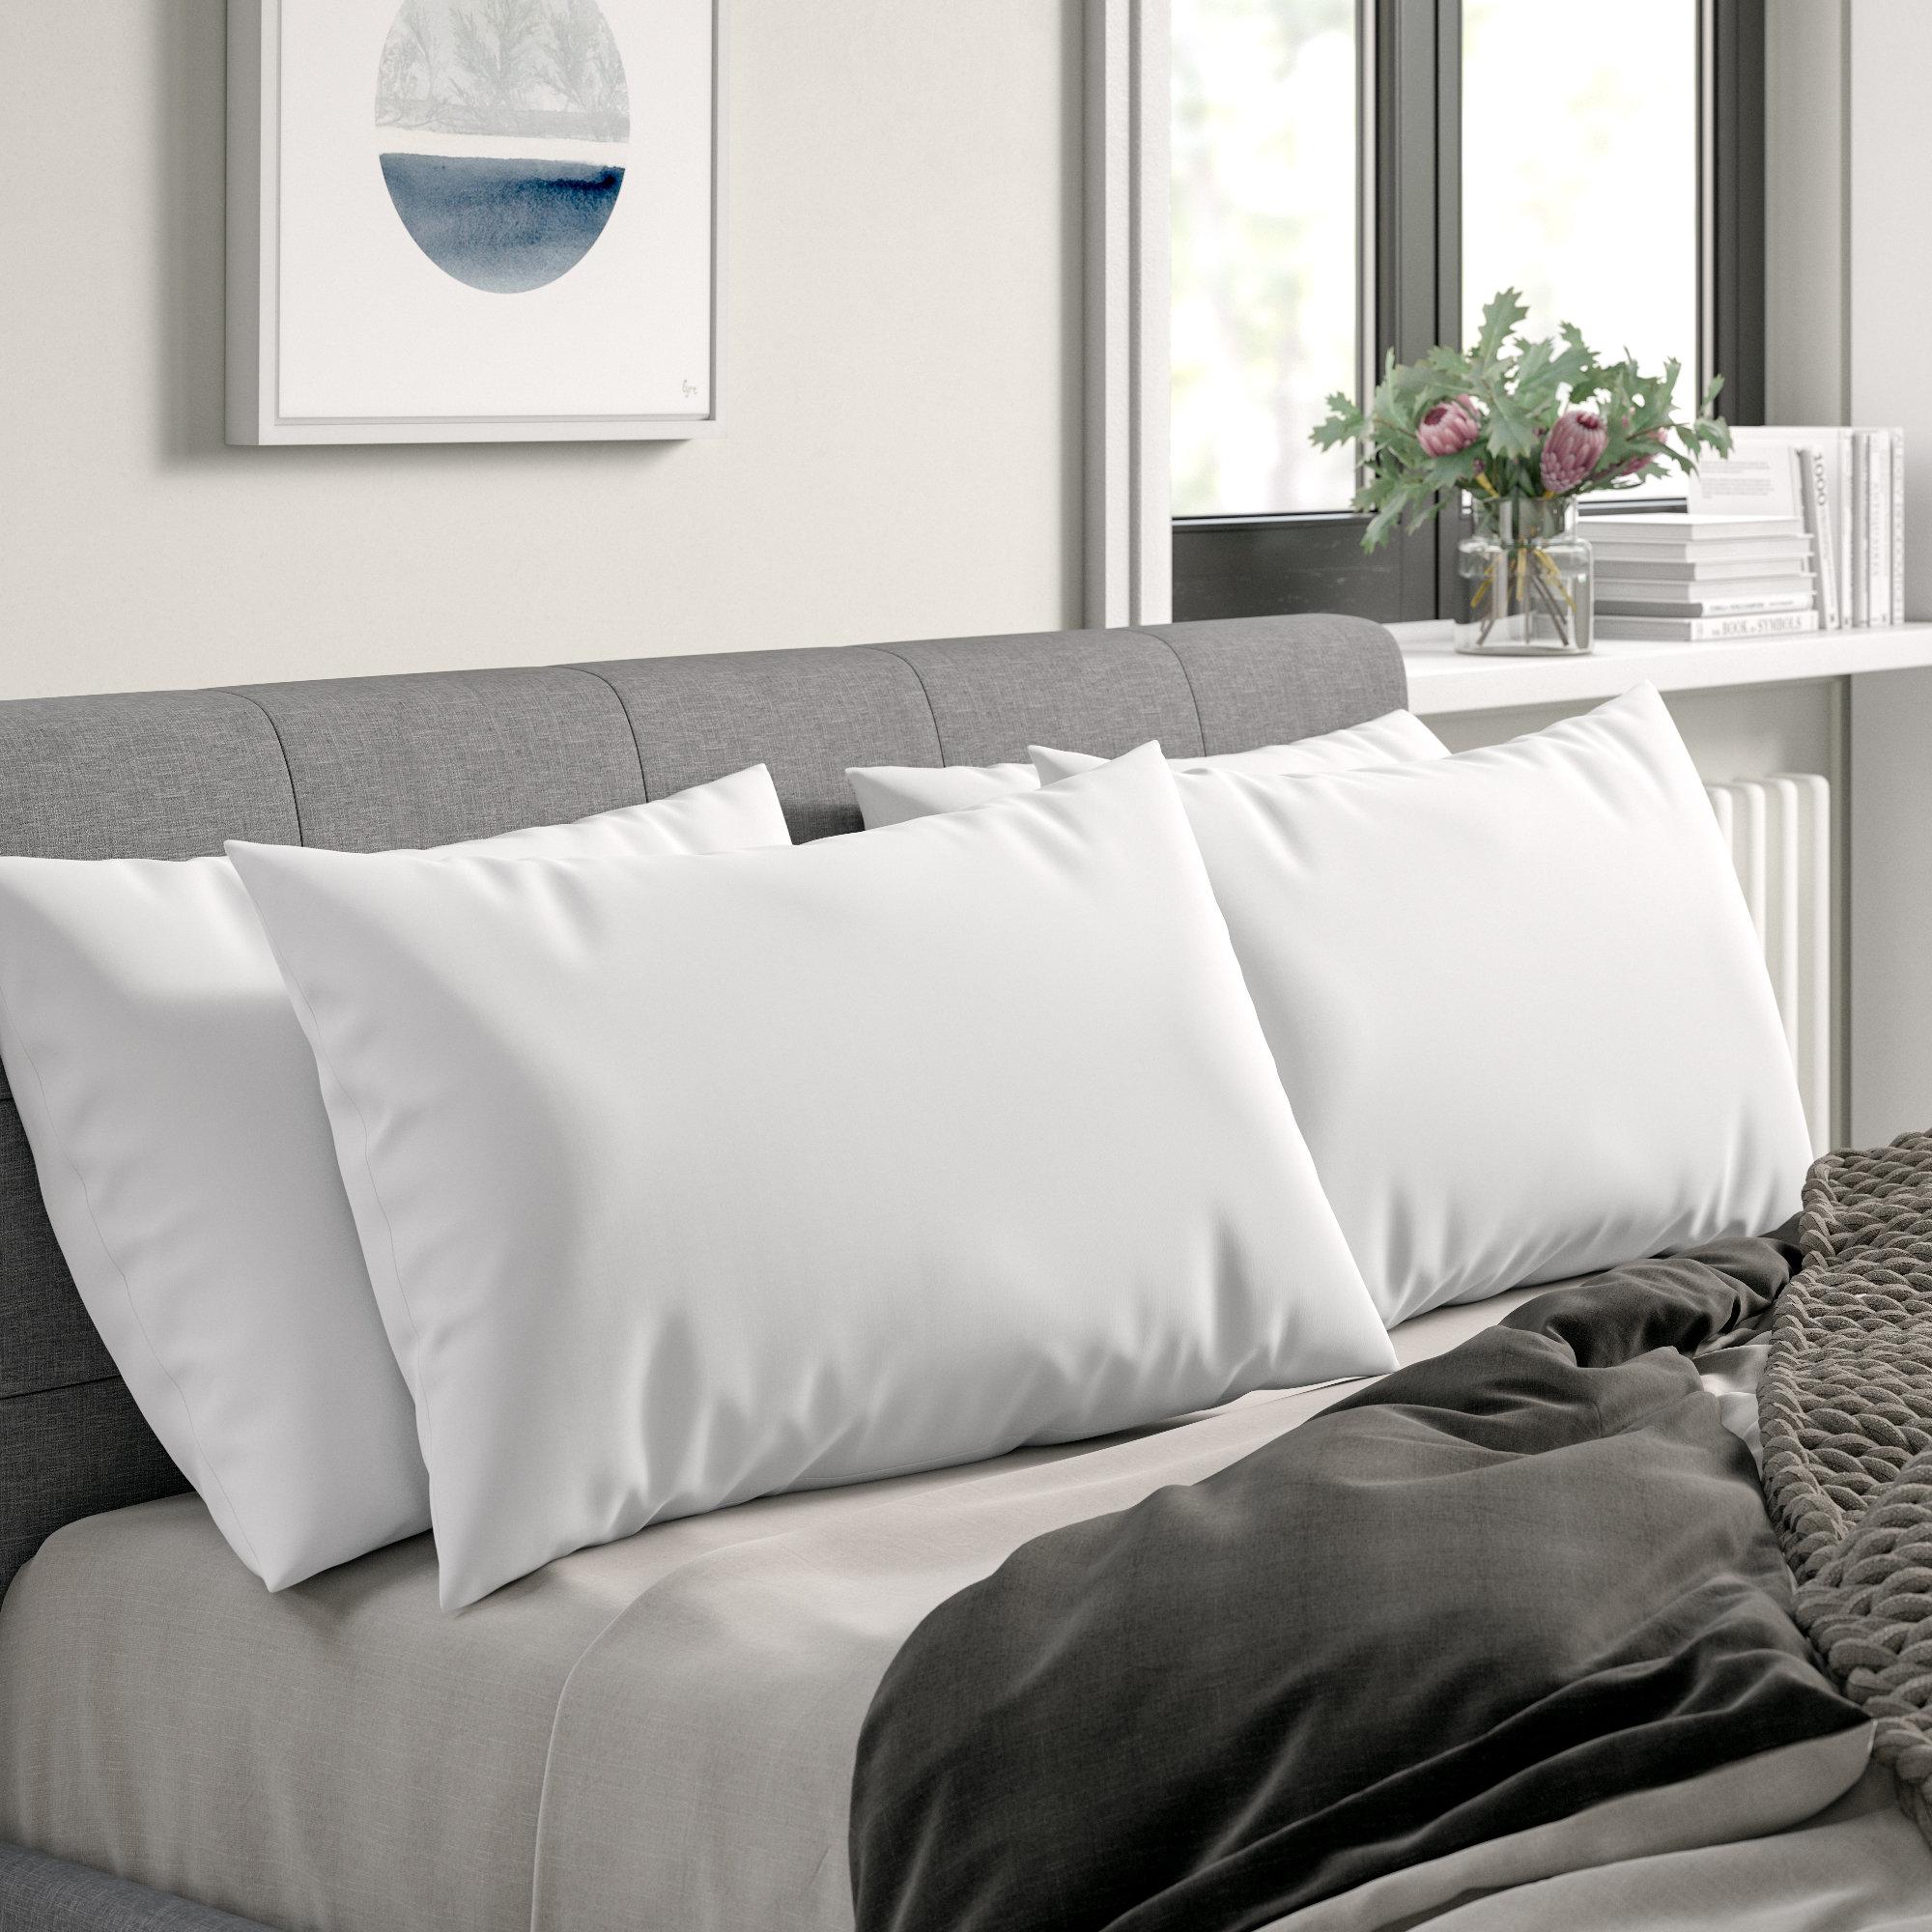 Slumberdown Big Hugs Hypoallergenic Medium Support Pillow